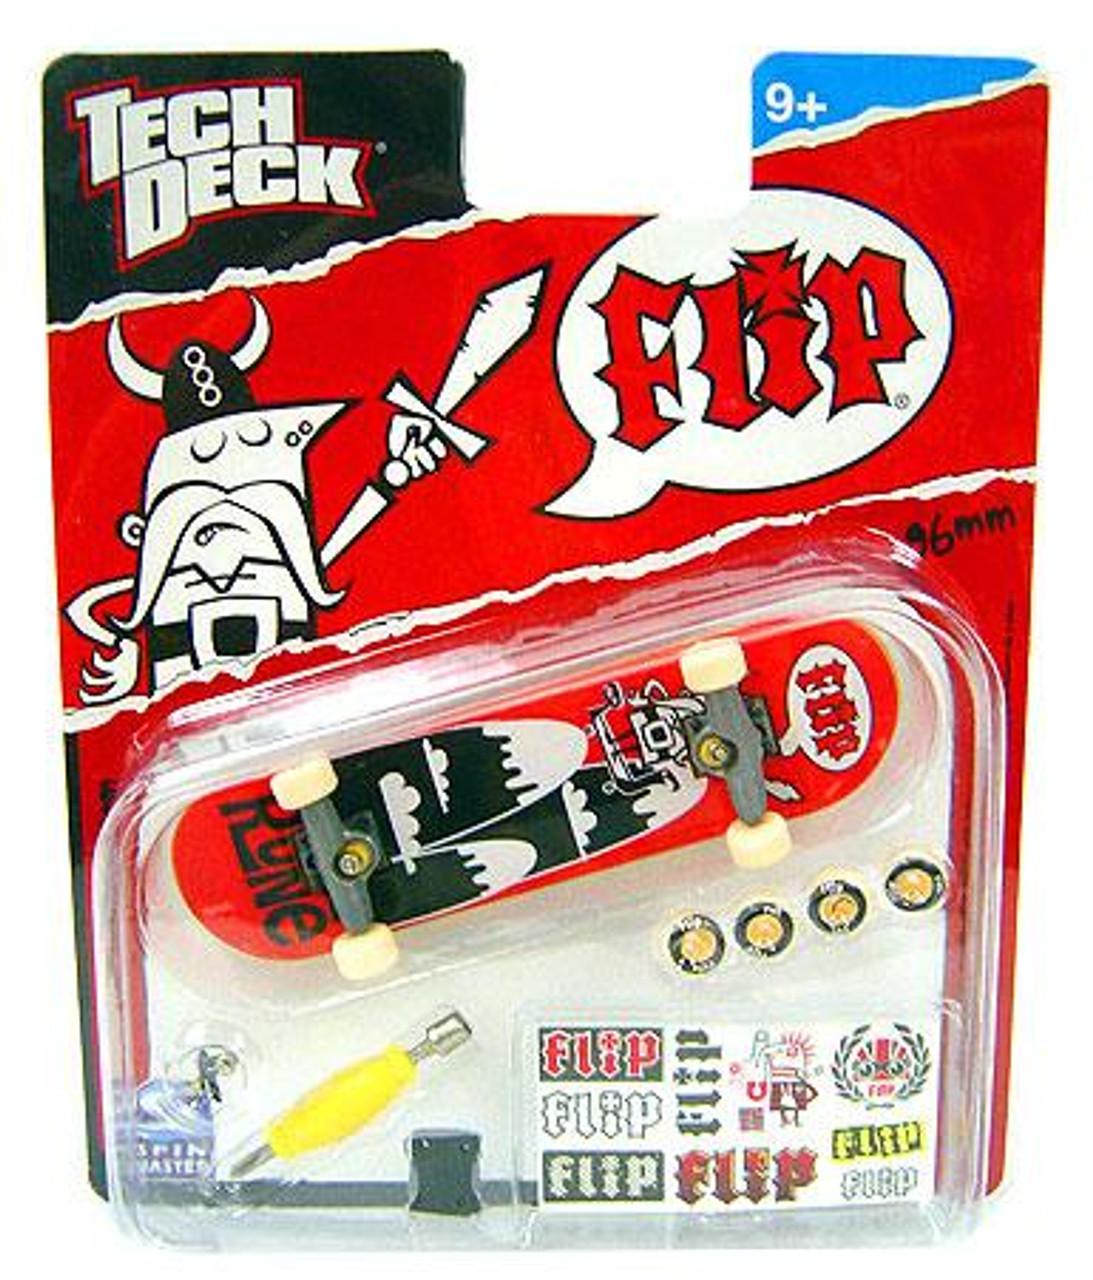 Tech Deck Flip 96mm Mini Skateboard [Rune Glifberg]